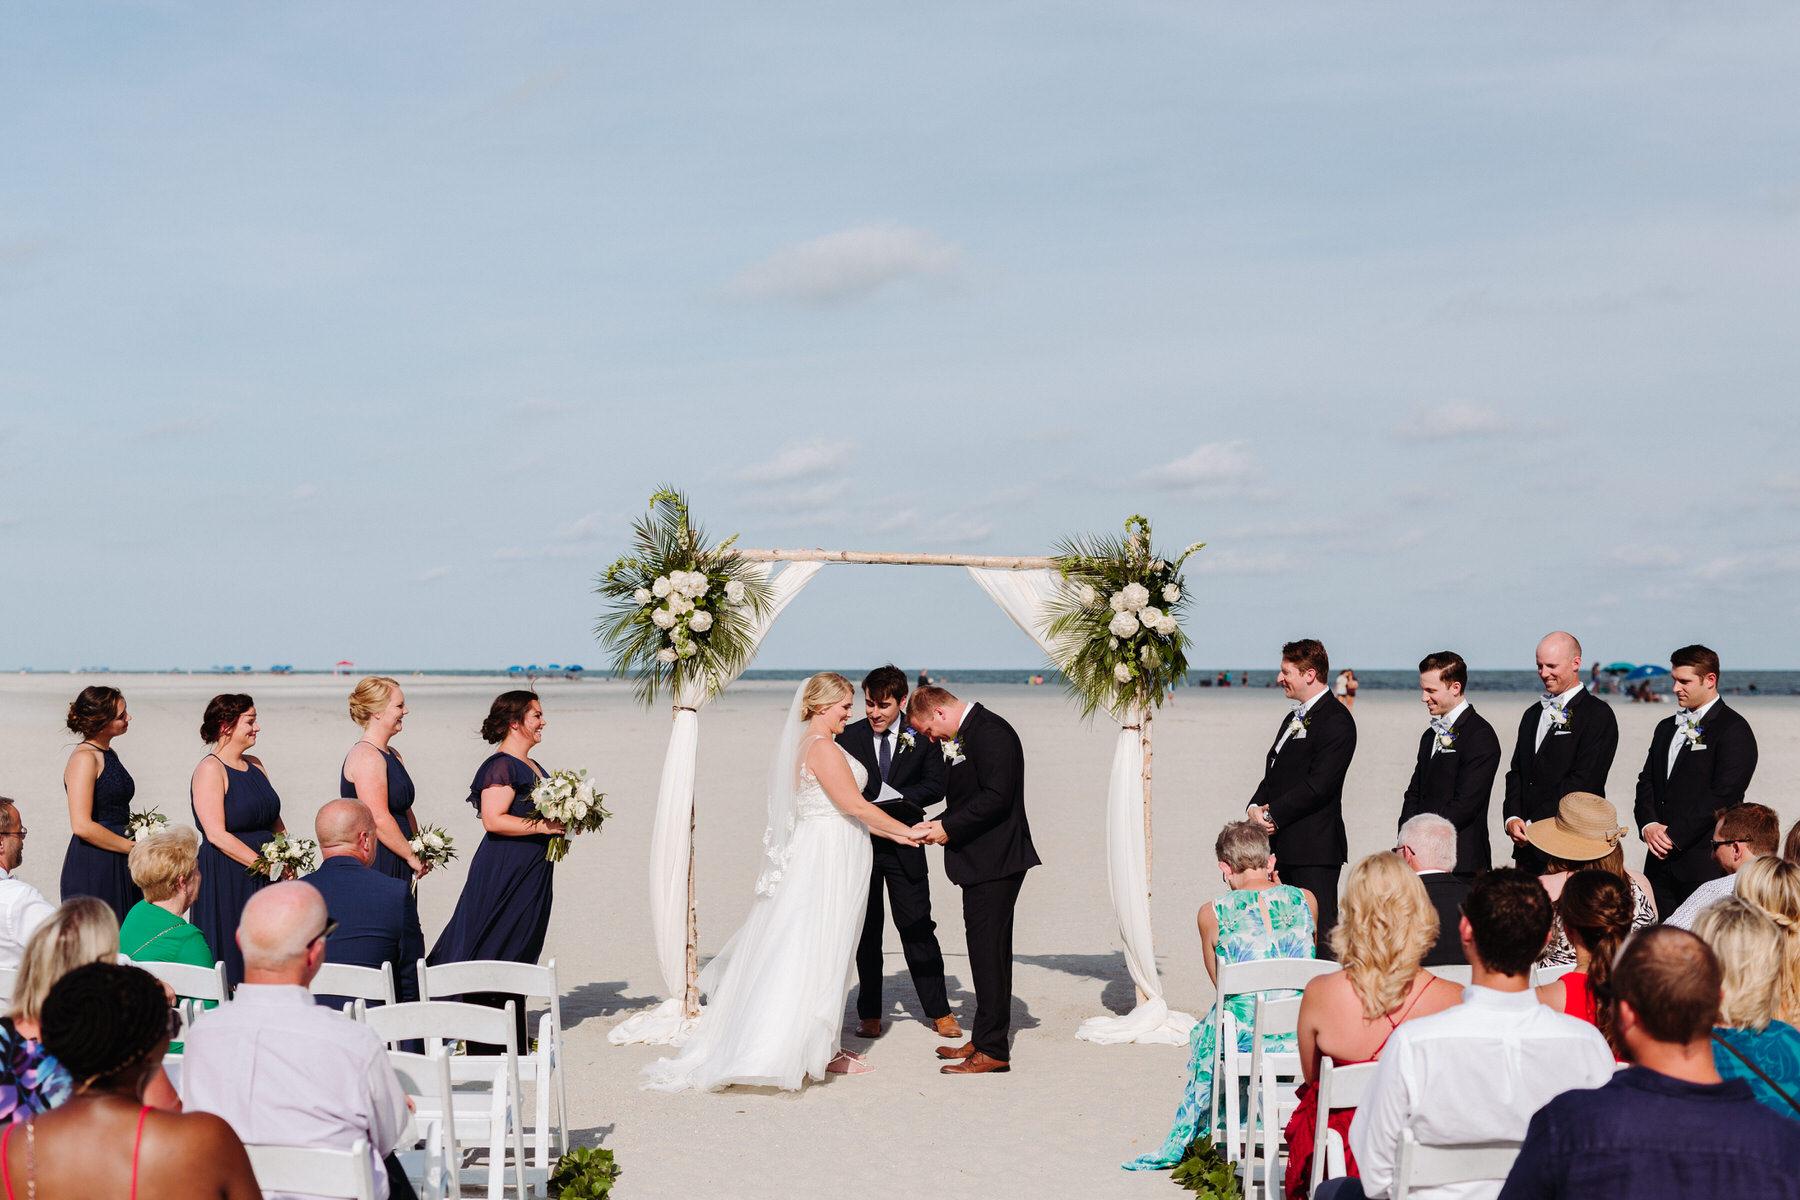 wild-dunes-charleston-isle-of-palms-IOP-wedding-803.JPG